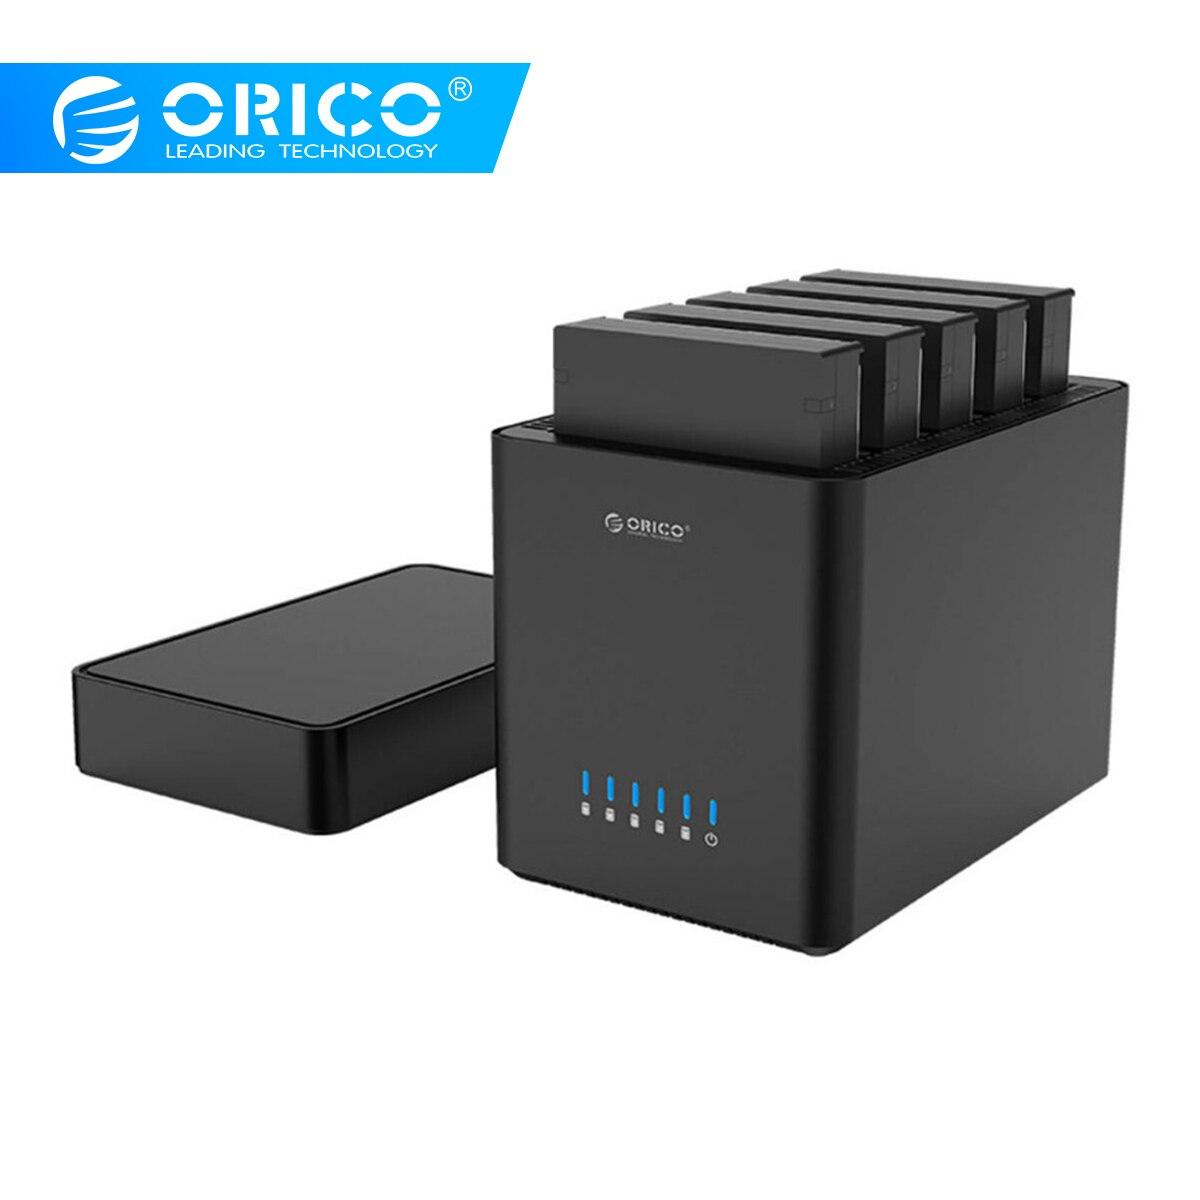 Carcasa de disco duro tipo magnético ORICO 5 Bay de 3,5 pulgadas USB3.0 a SATA3.0 3,5 En HDD compatible con UASP ¡12V6! potencia máxima de 5 a 50 TB